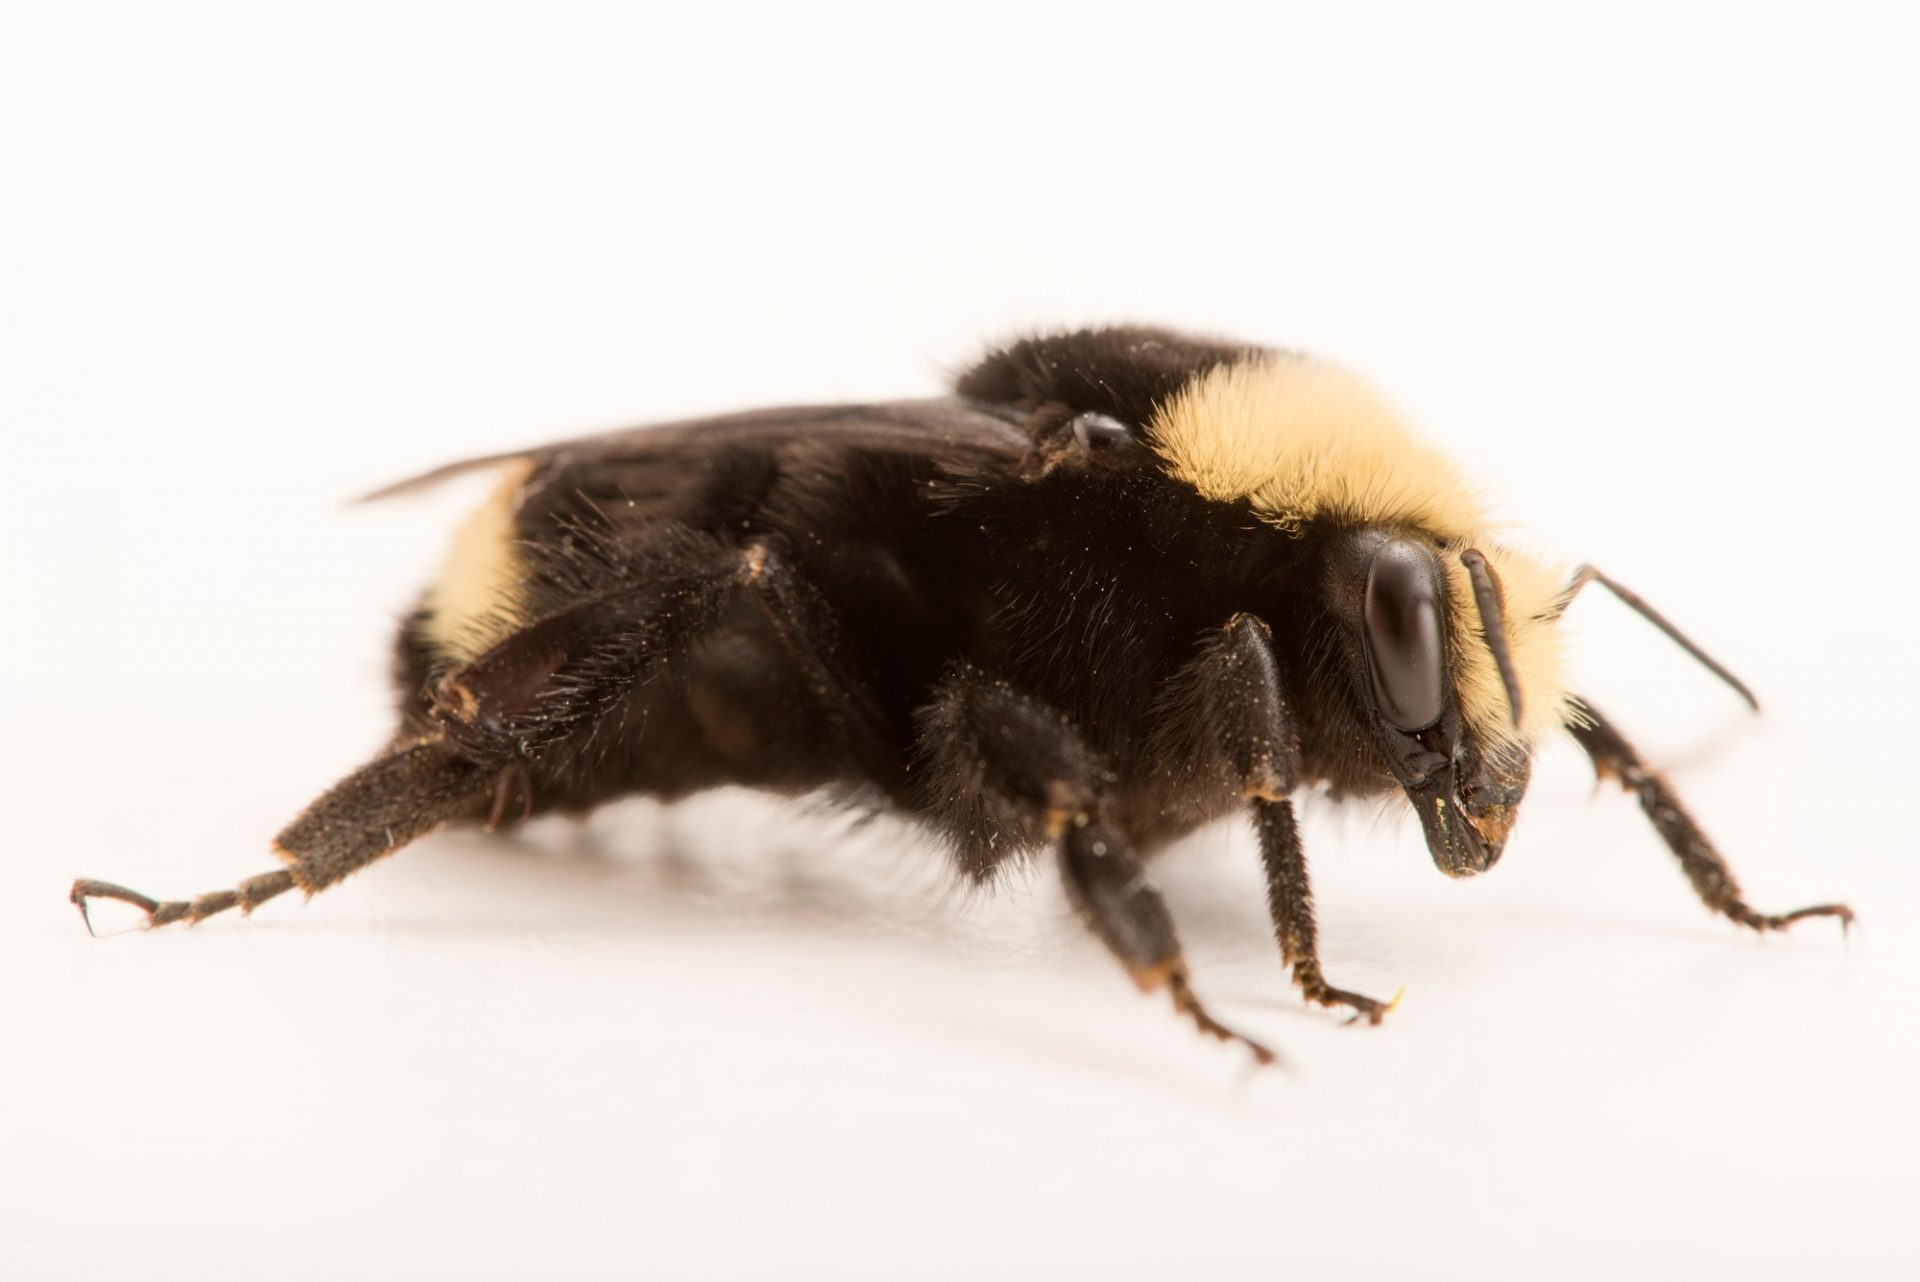 A yellow-faced bumblebee (Bombus vosnesenskii) at A Rocha Brooksdale Environmental Center in Surrey, BC.